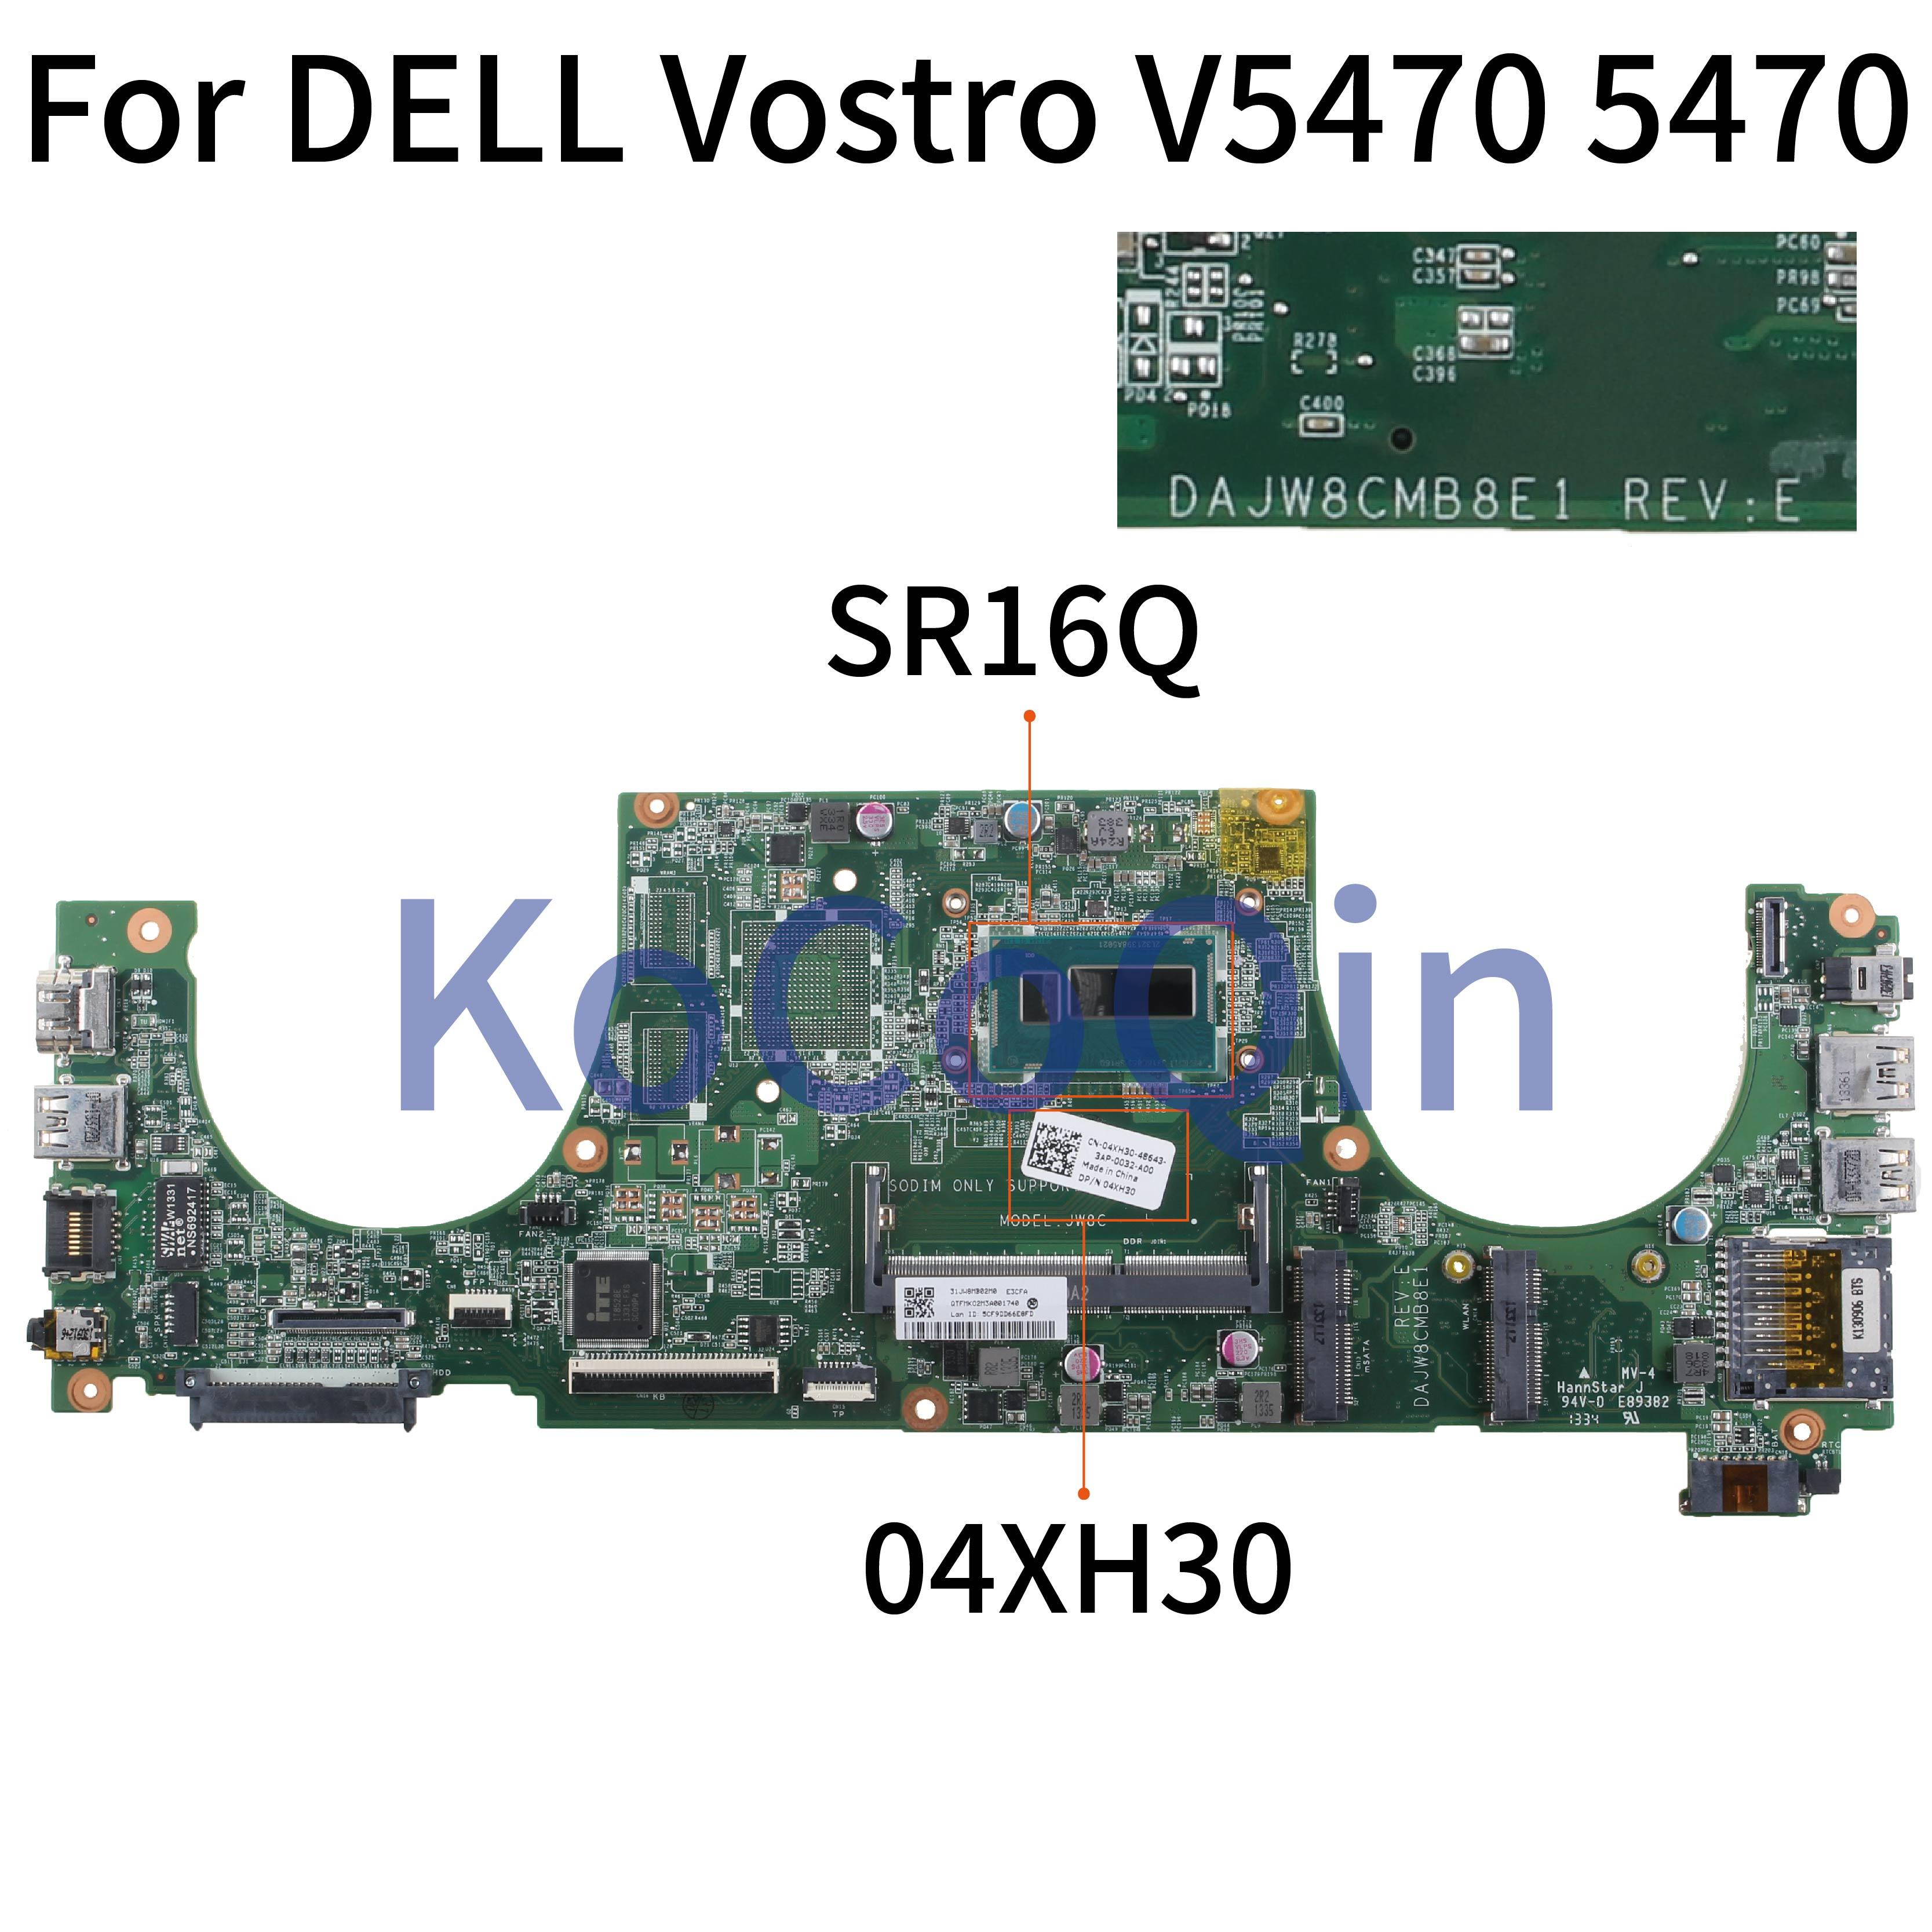 Kocoqin placa-mãe do portátil para dell vostro 5470 v5470 núcleo mainboard i3 sr16q CN-04XH30 04xh30 dajw8gmb8e1